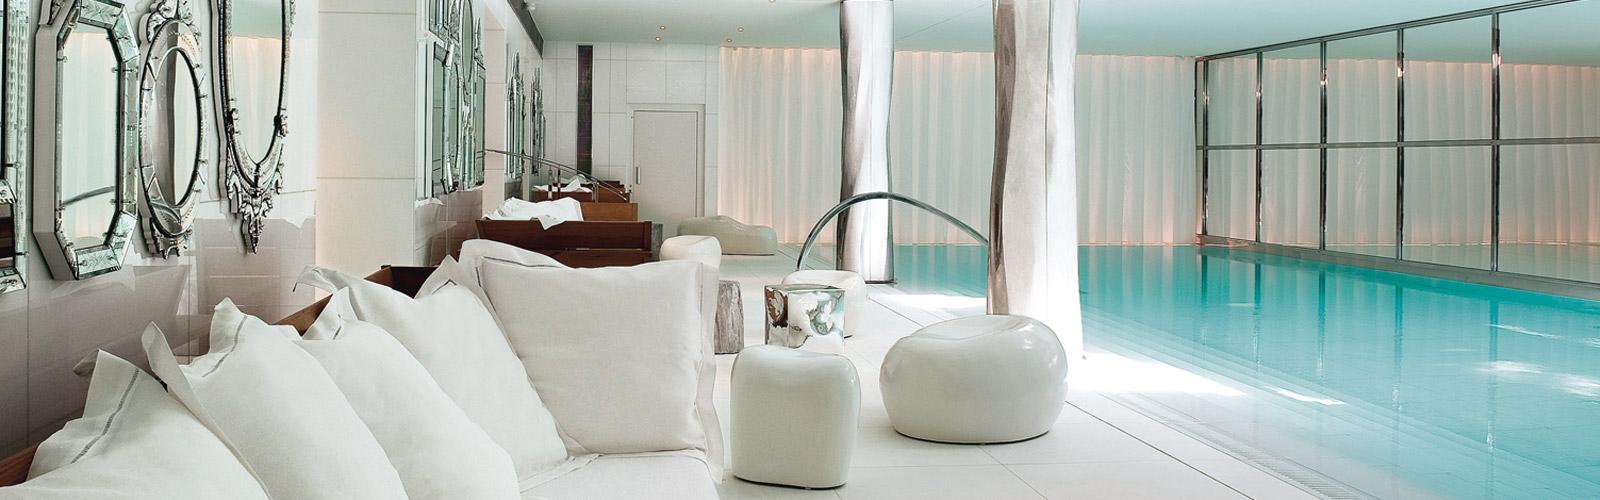 Terrific 10 Redenen Om Te Vertrouwen Op Clarins Clarins Dailytribune Chair Design For Home Dailytribuneorg